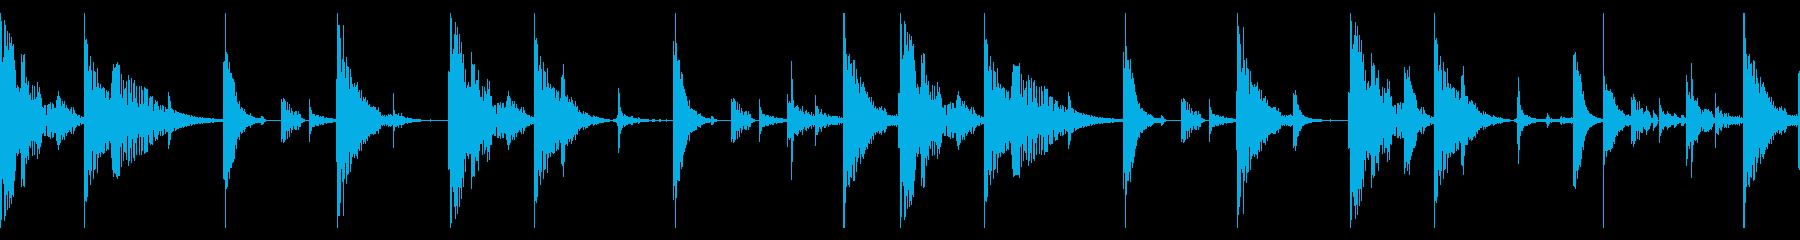 60 BPMの再生済みの波形